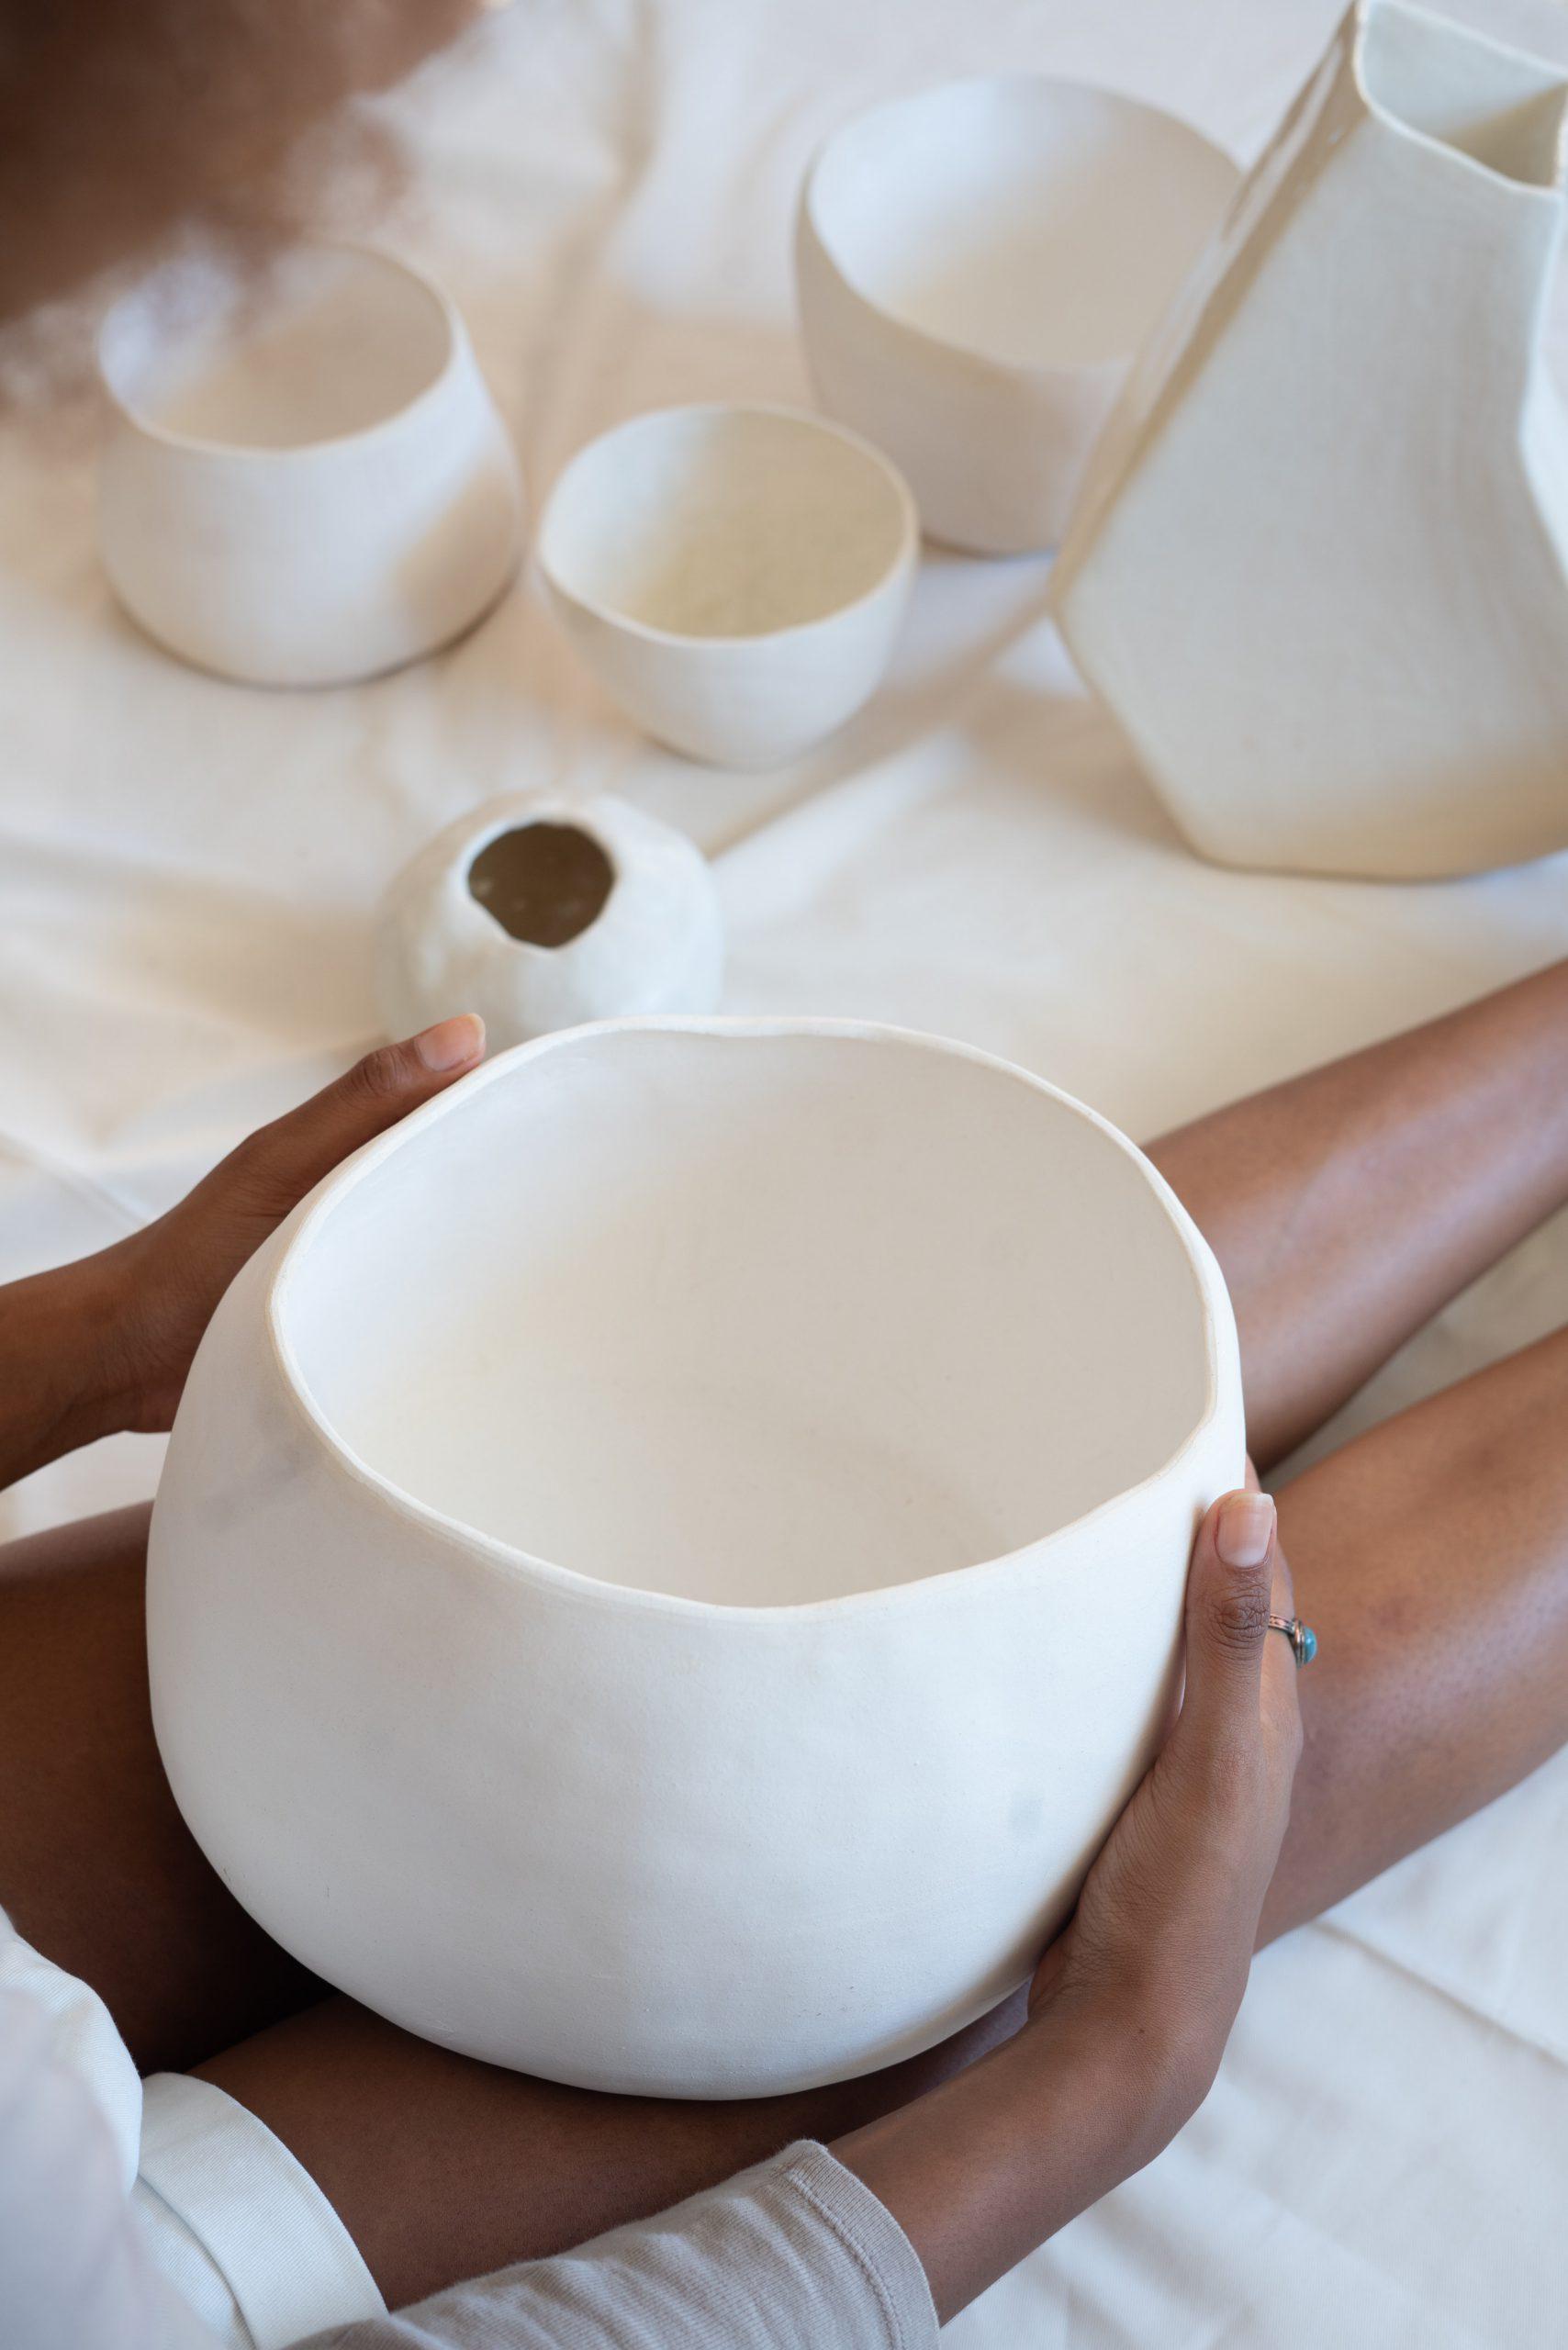 femme tenant un bol de poterie